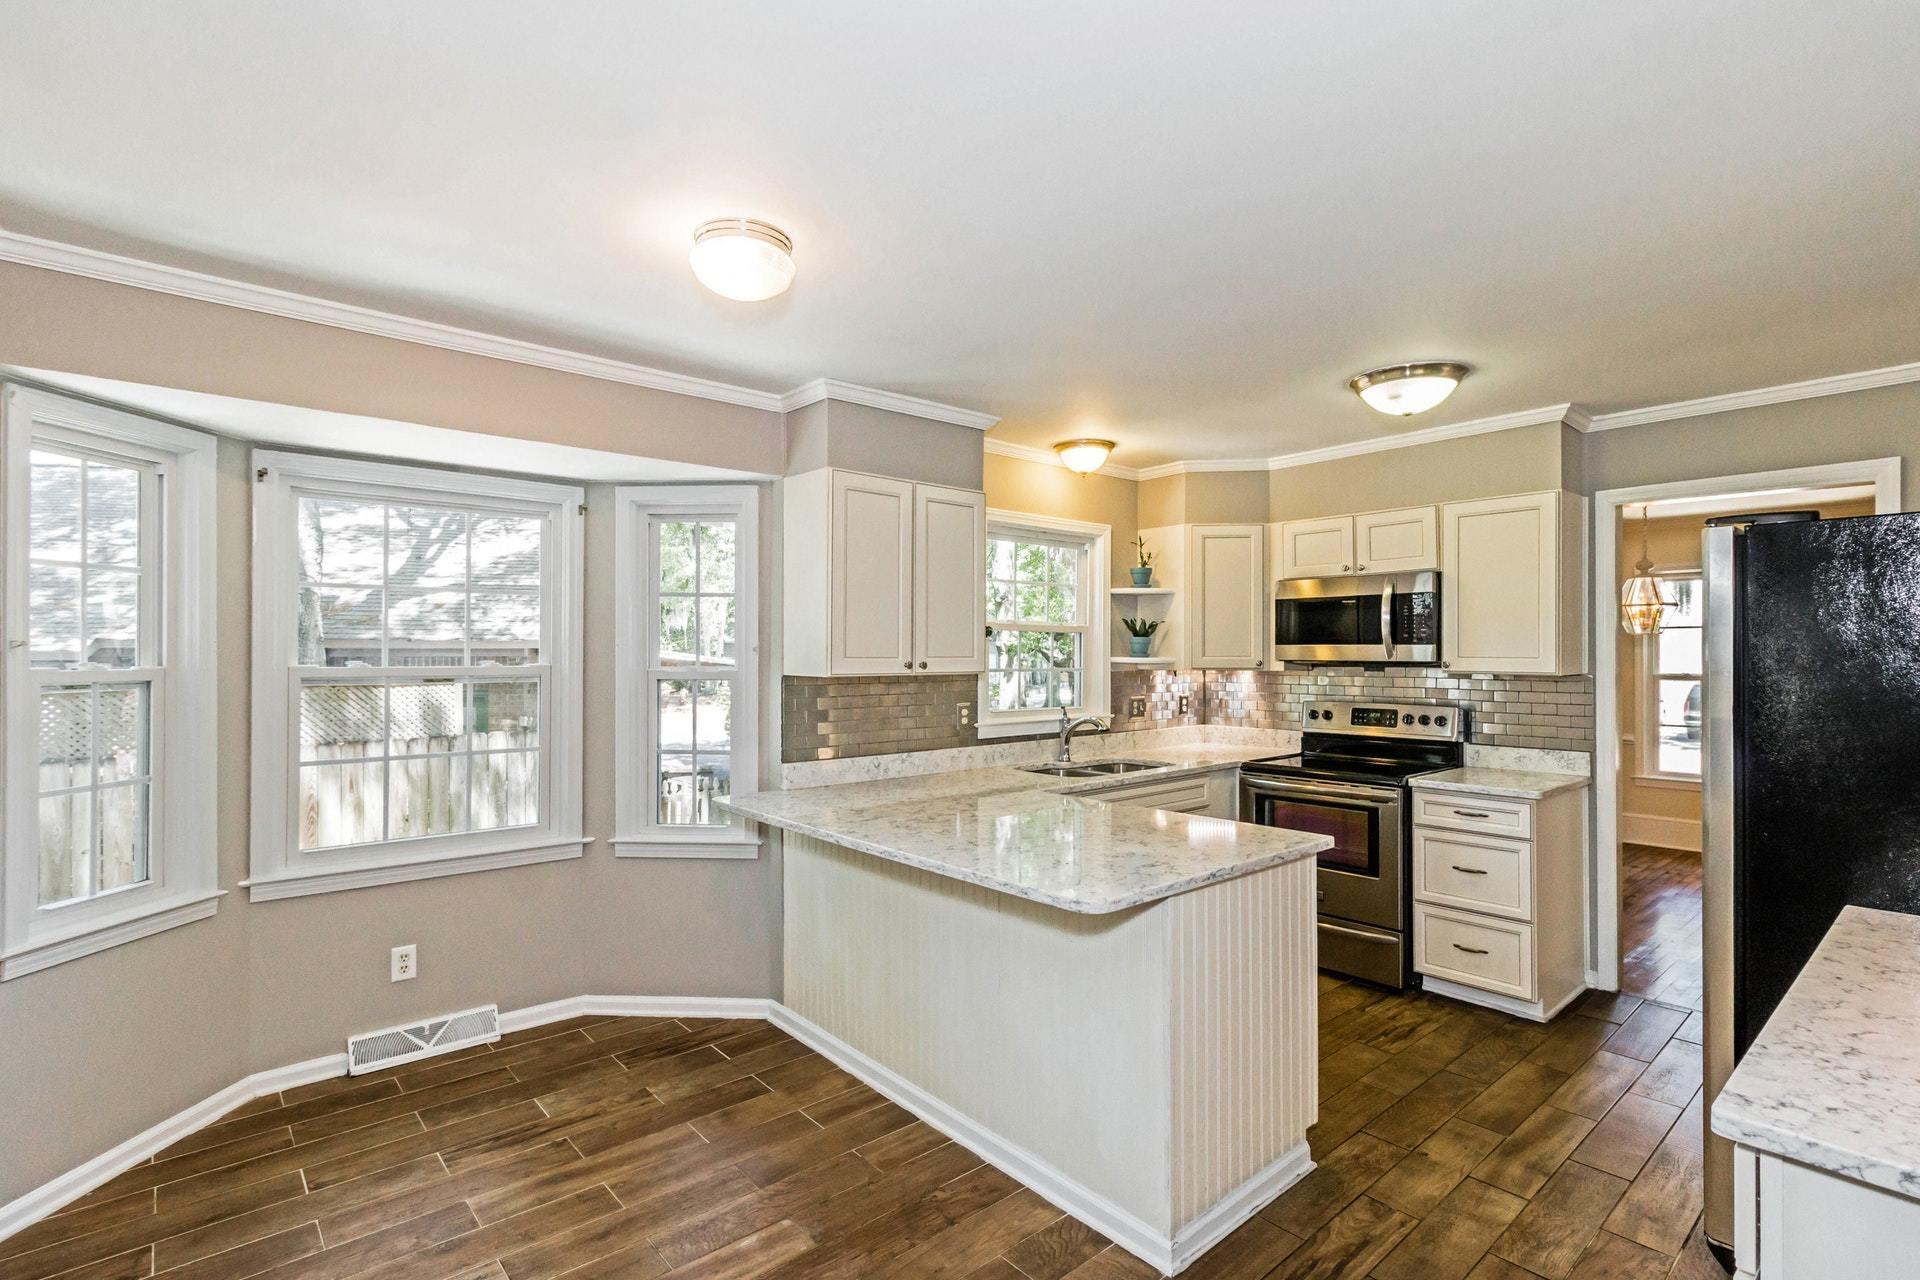 Shemwood II Homes For Sale - 969 Sea Gull, Mount Pleasant, SC - 19